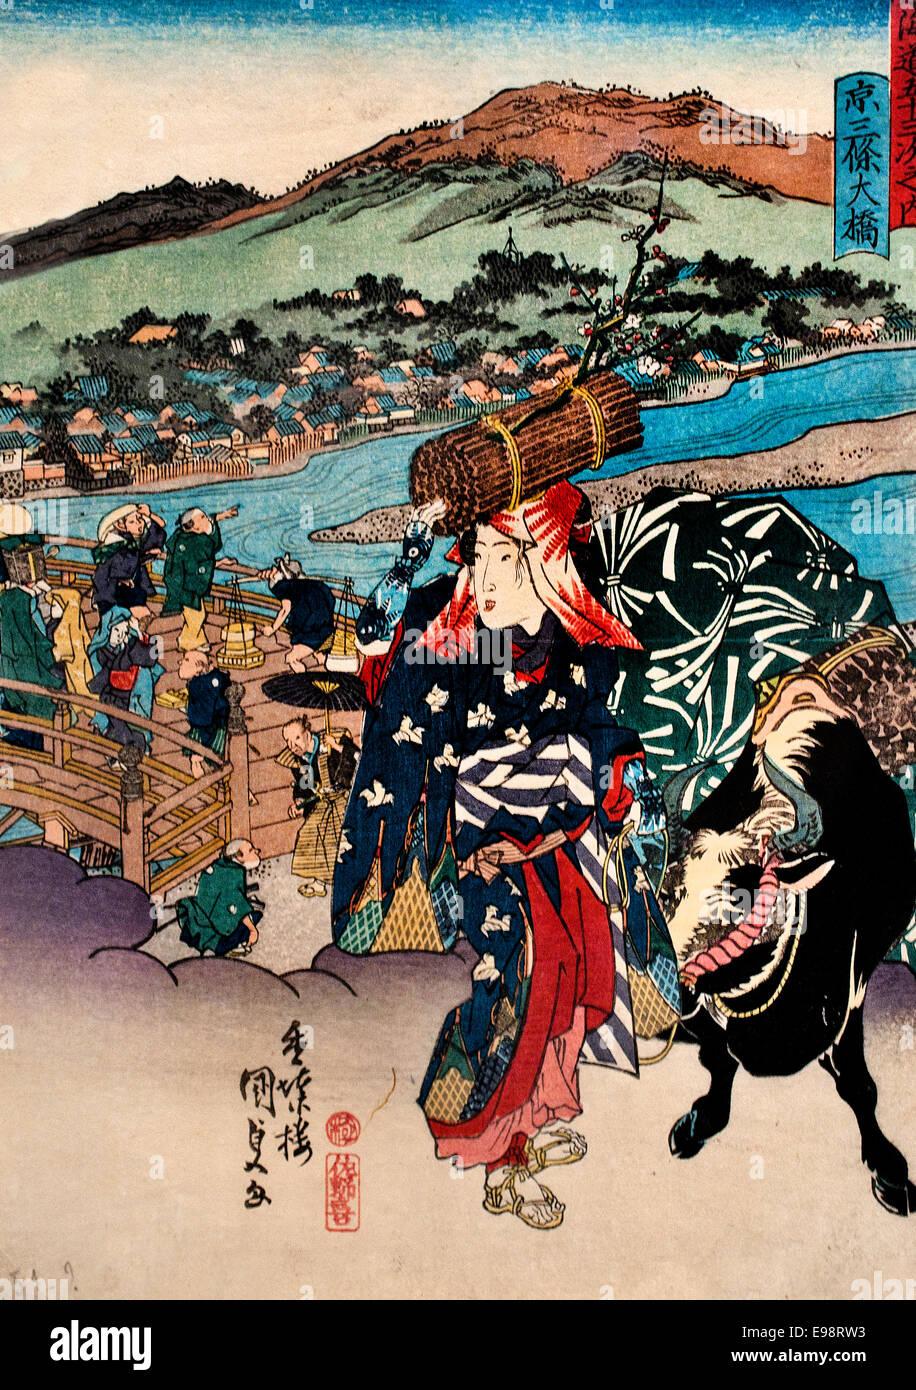 The Tokaido Fifty-three relay Yuri 1830-1843 Utagawa Kunisada 1786-1864 Japan Japanese - Stock Image